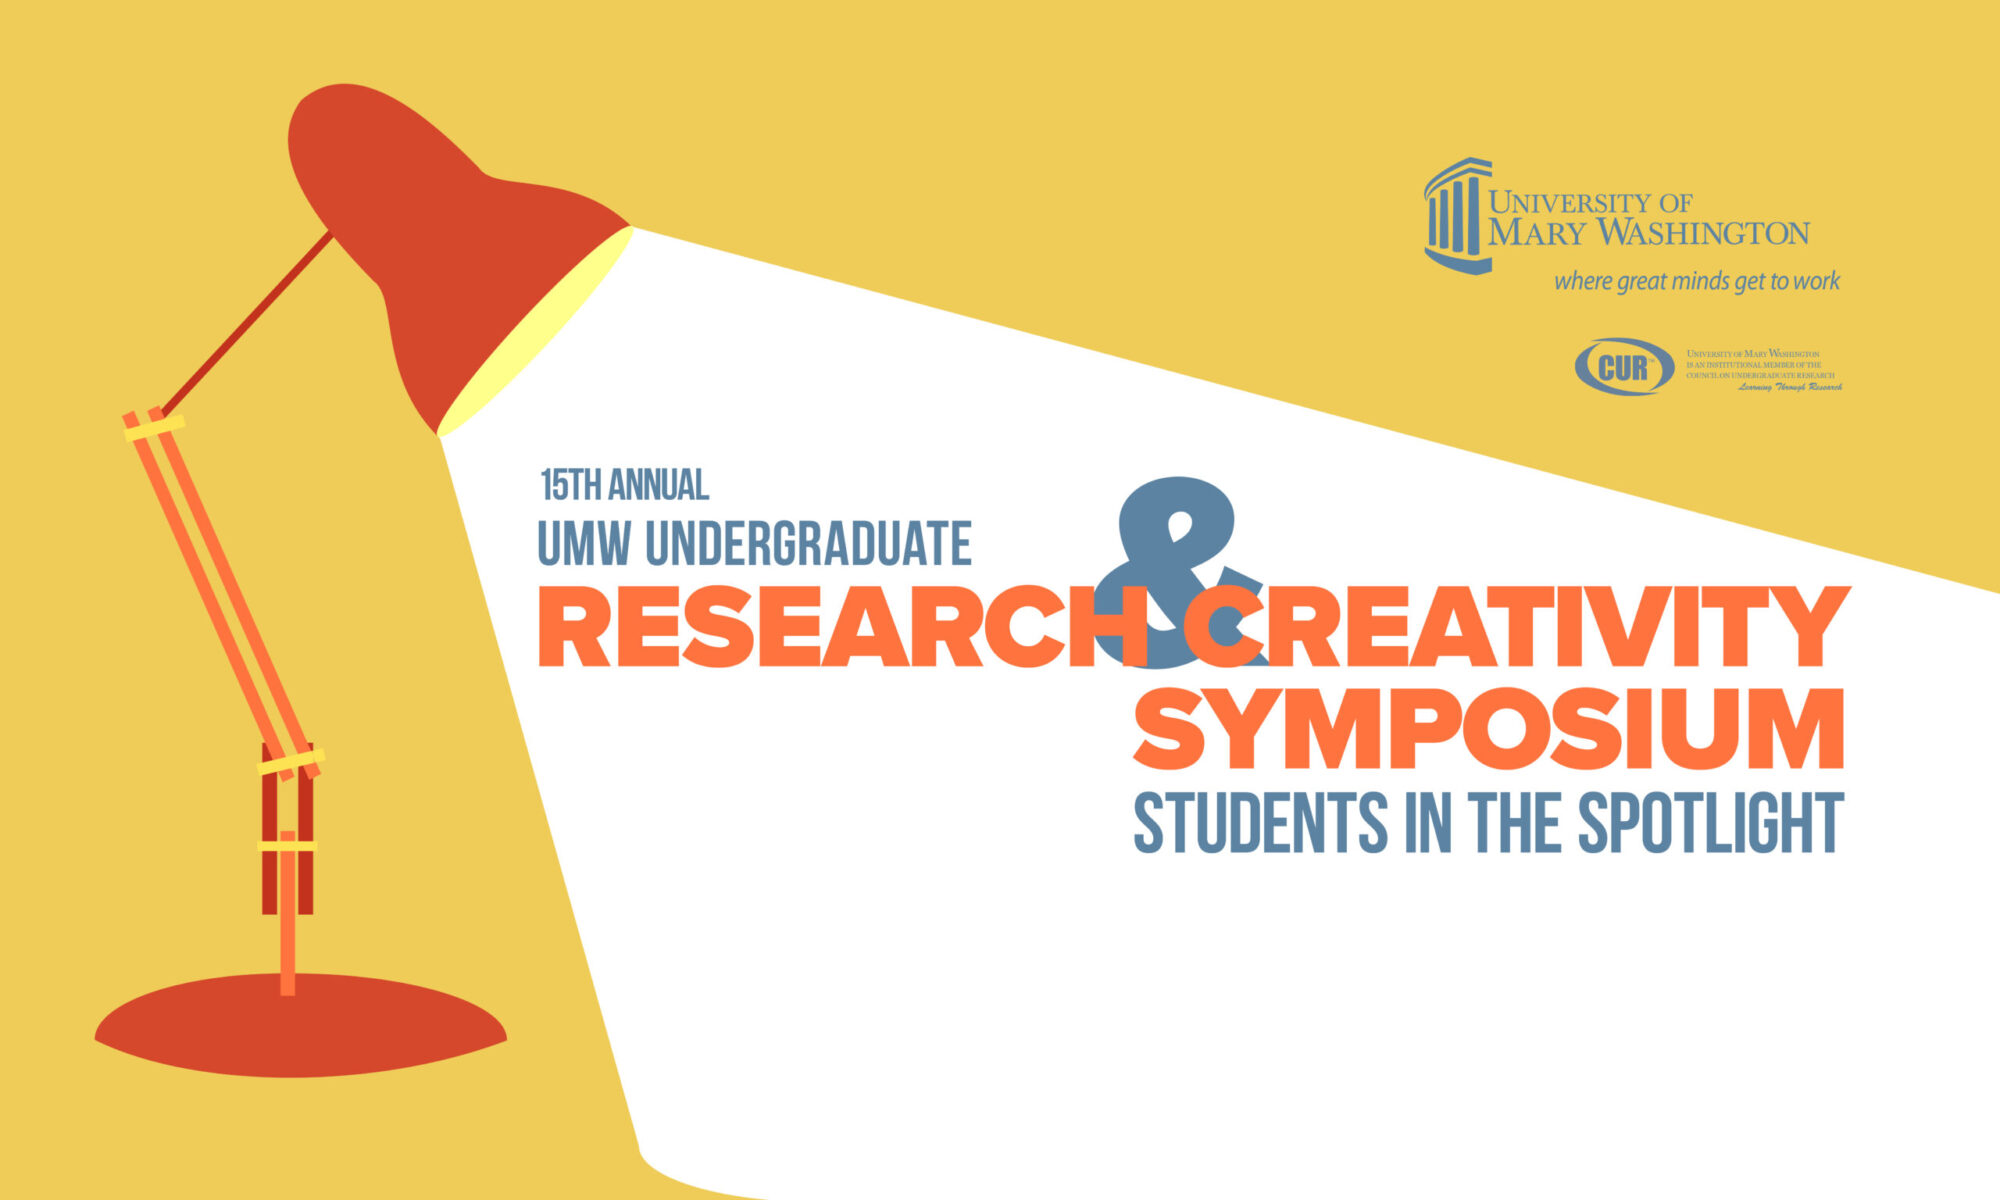 UMW Undergraduate Research and Creativity